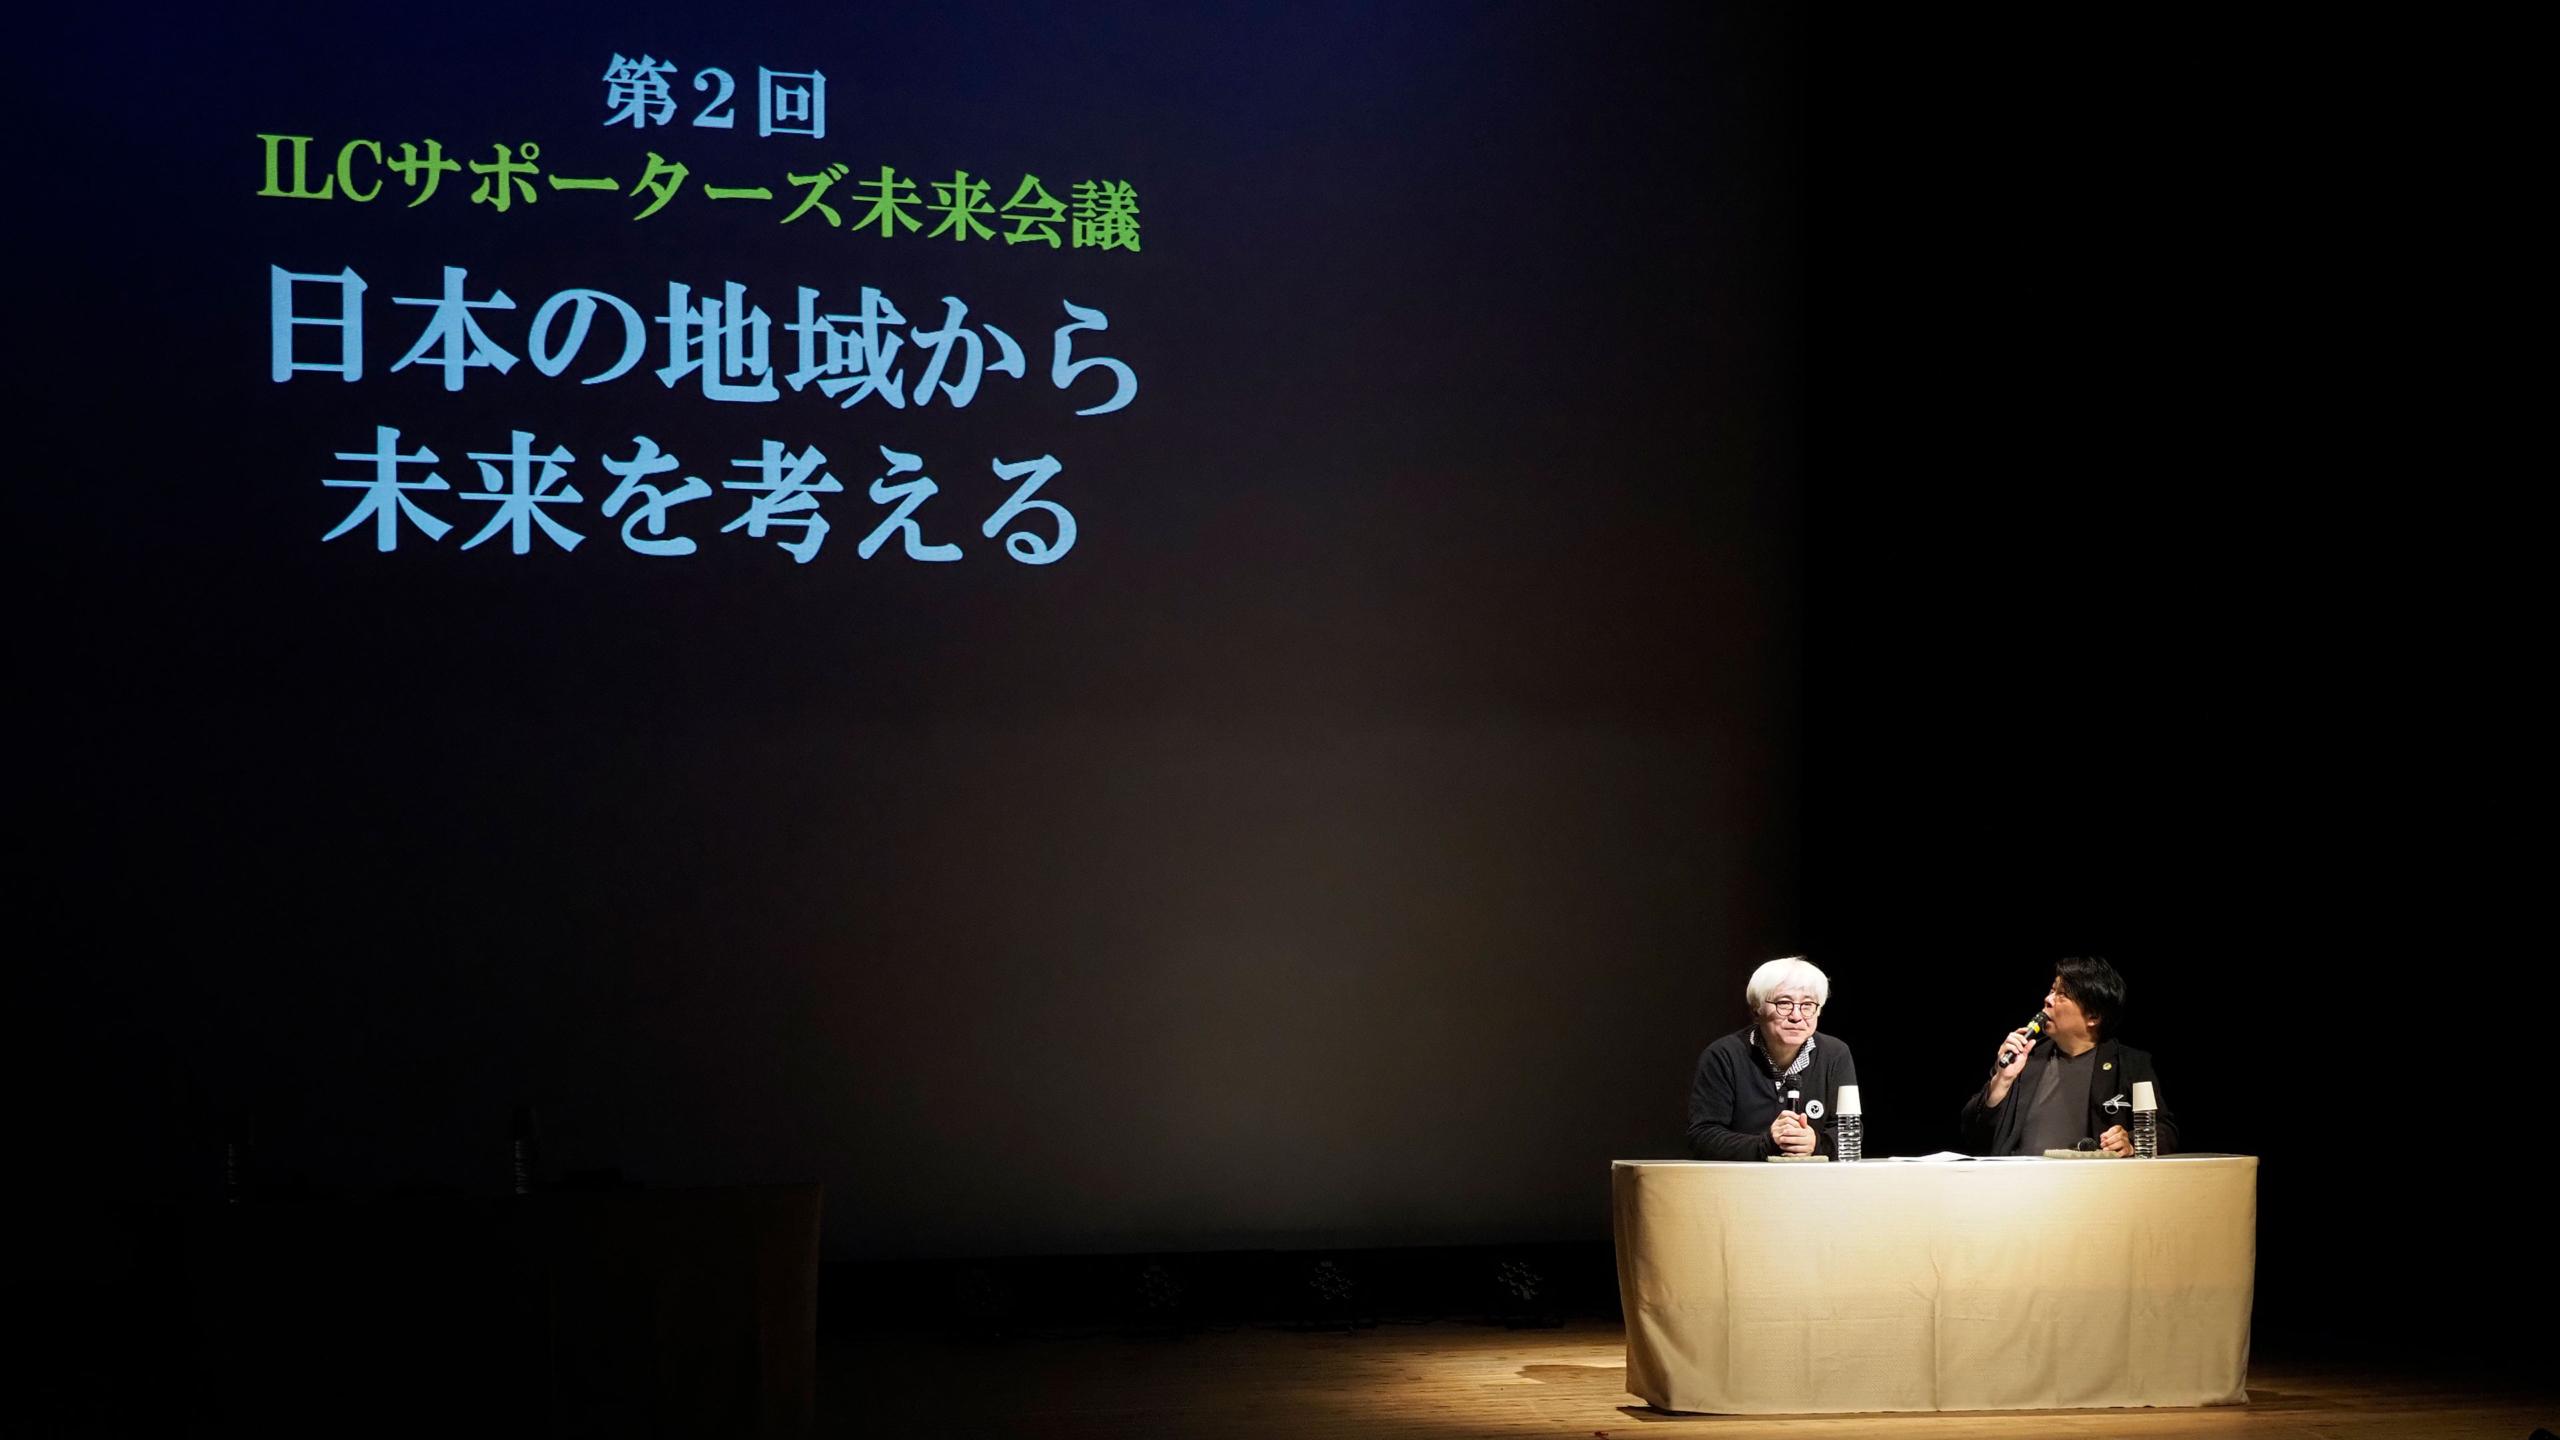 ILCサポーターズ未来会議第2回in丘フェス 日本の地域から未来を考える